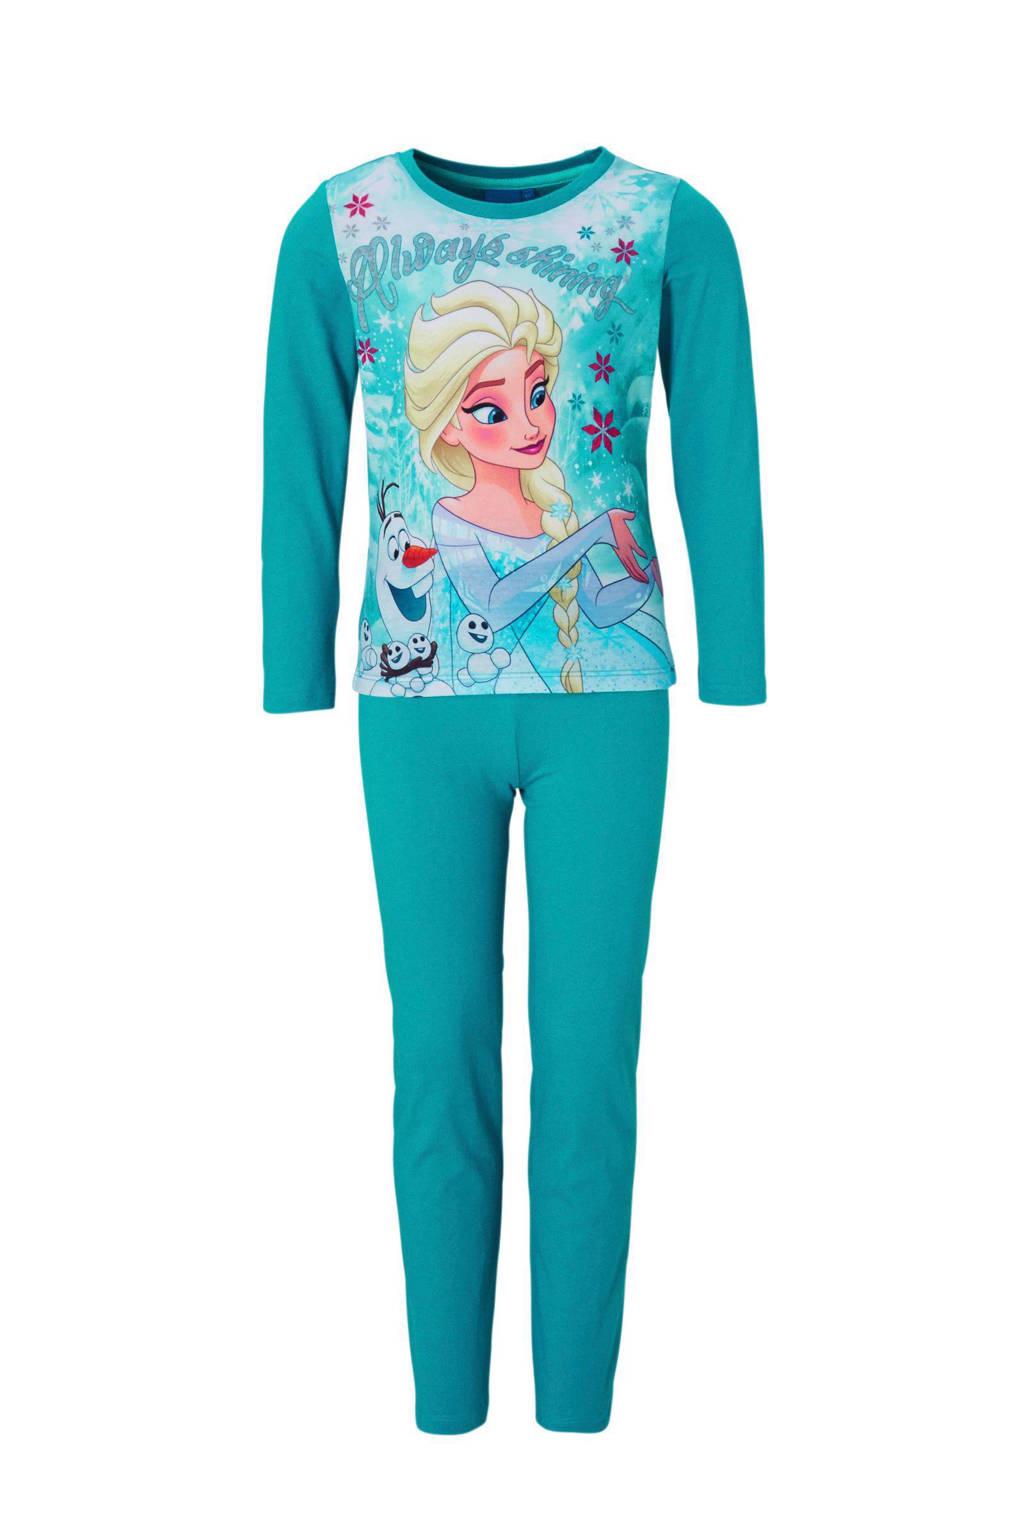 ccf1220f997 Frozen pyjama | wehkamp